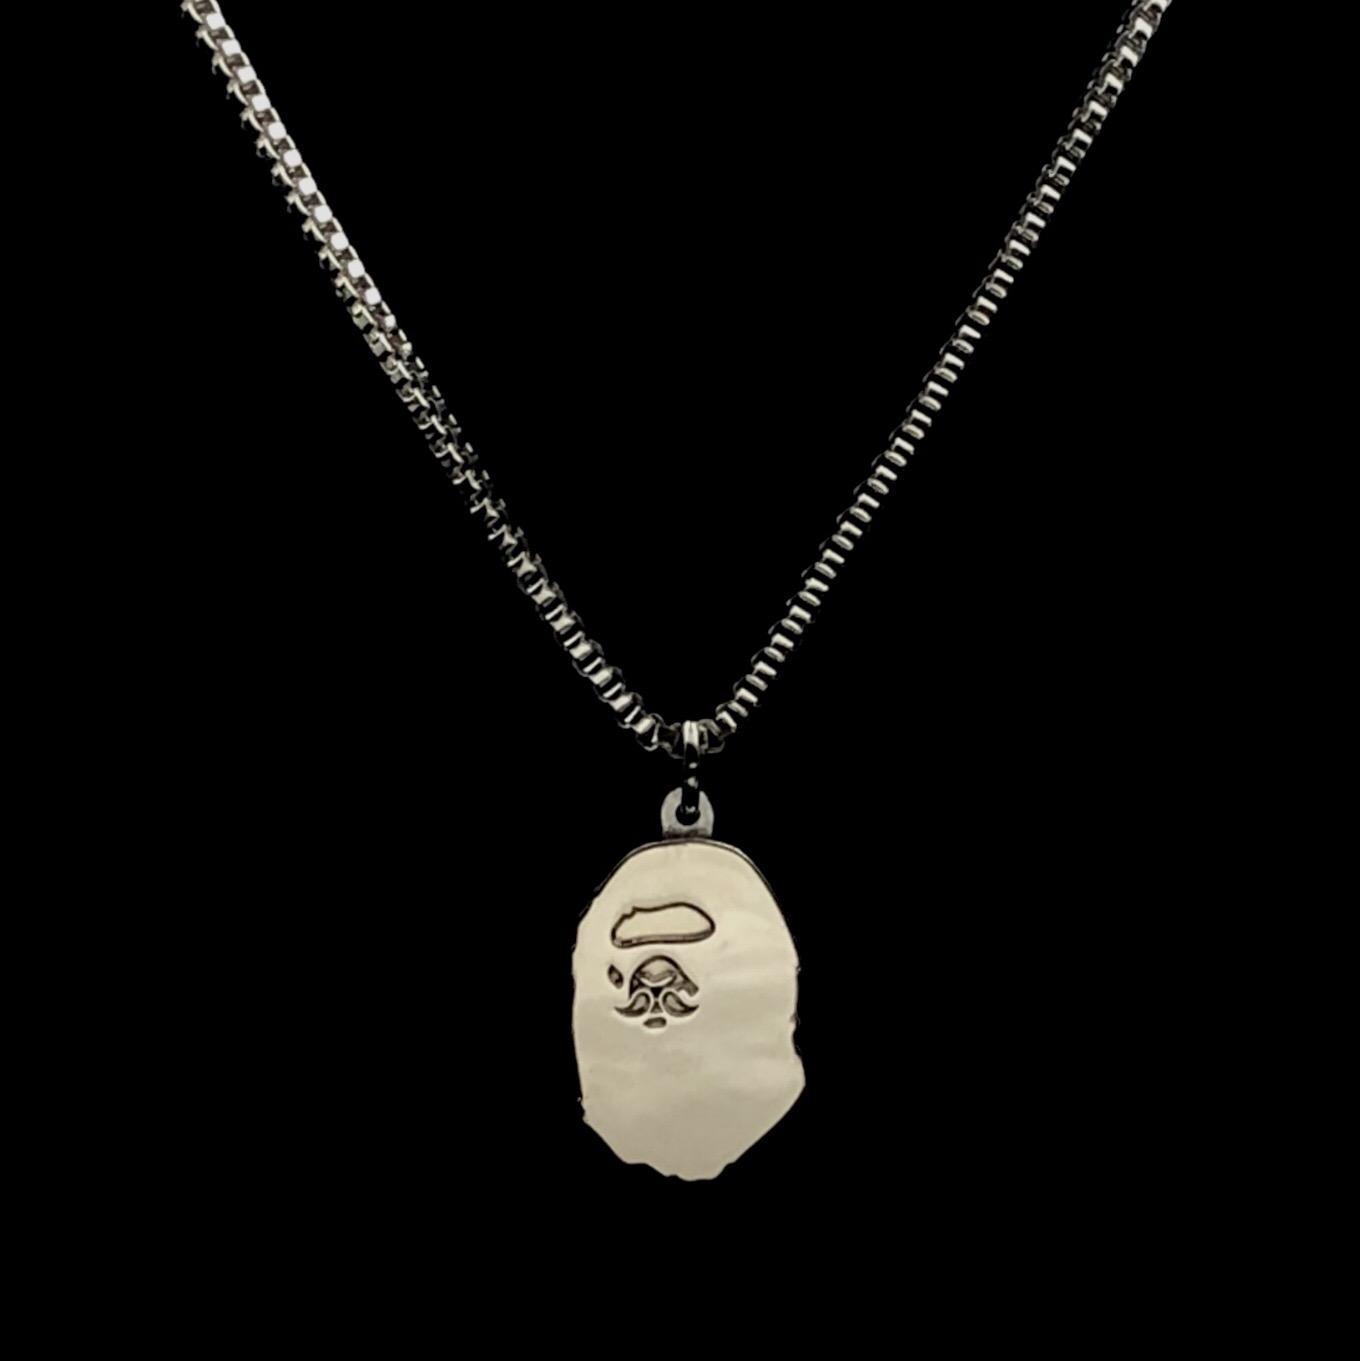 9c1abe24 Bape Mr. Bathing Ape Ape Head Pin Necklace | Grailed